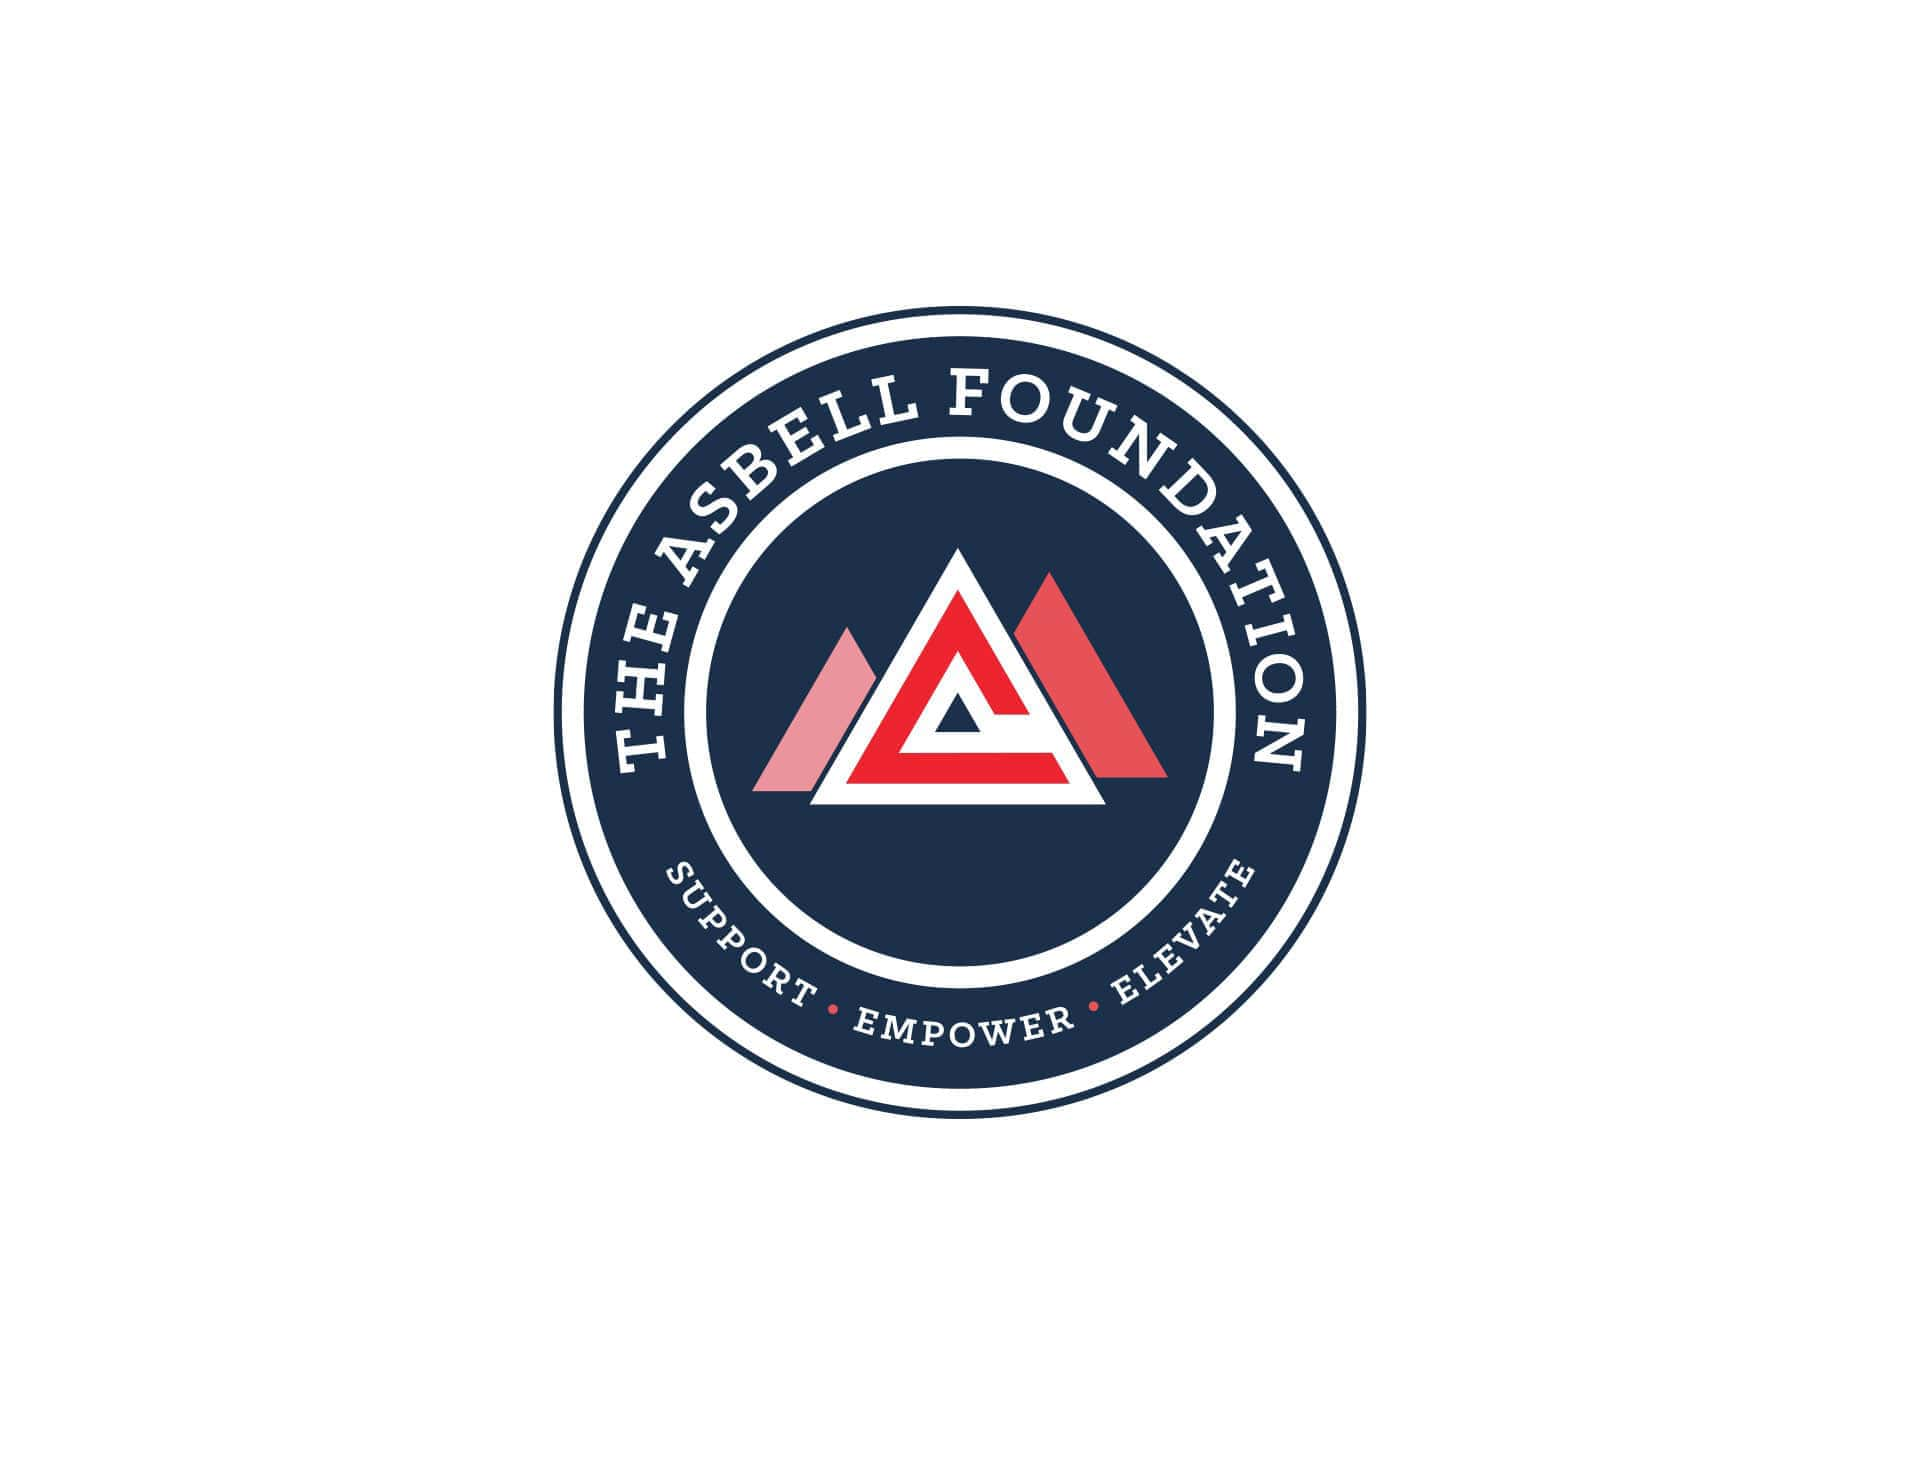 Asbell Foundation Logo